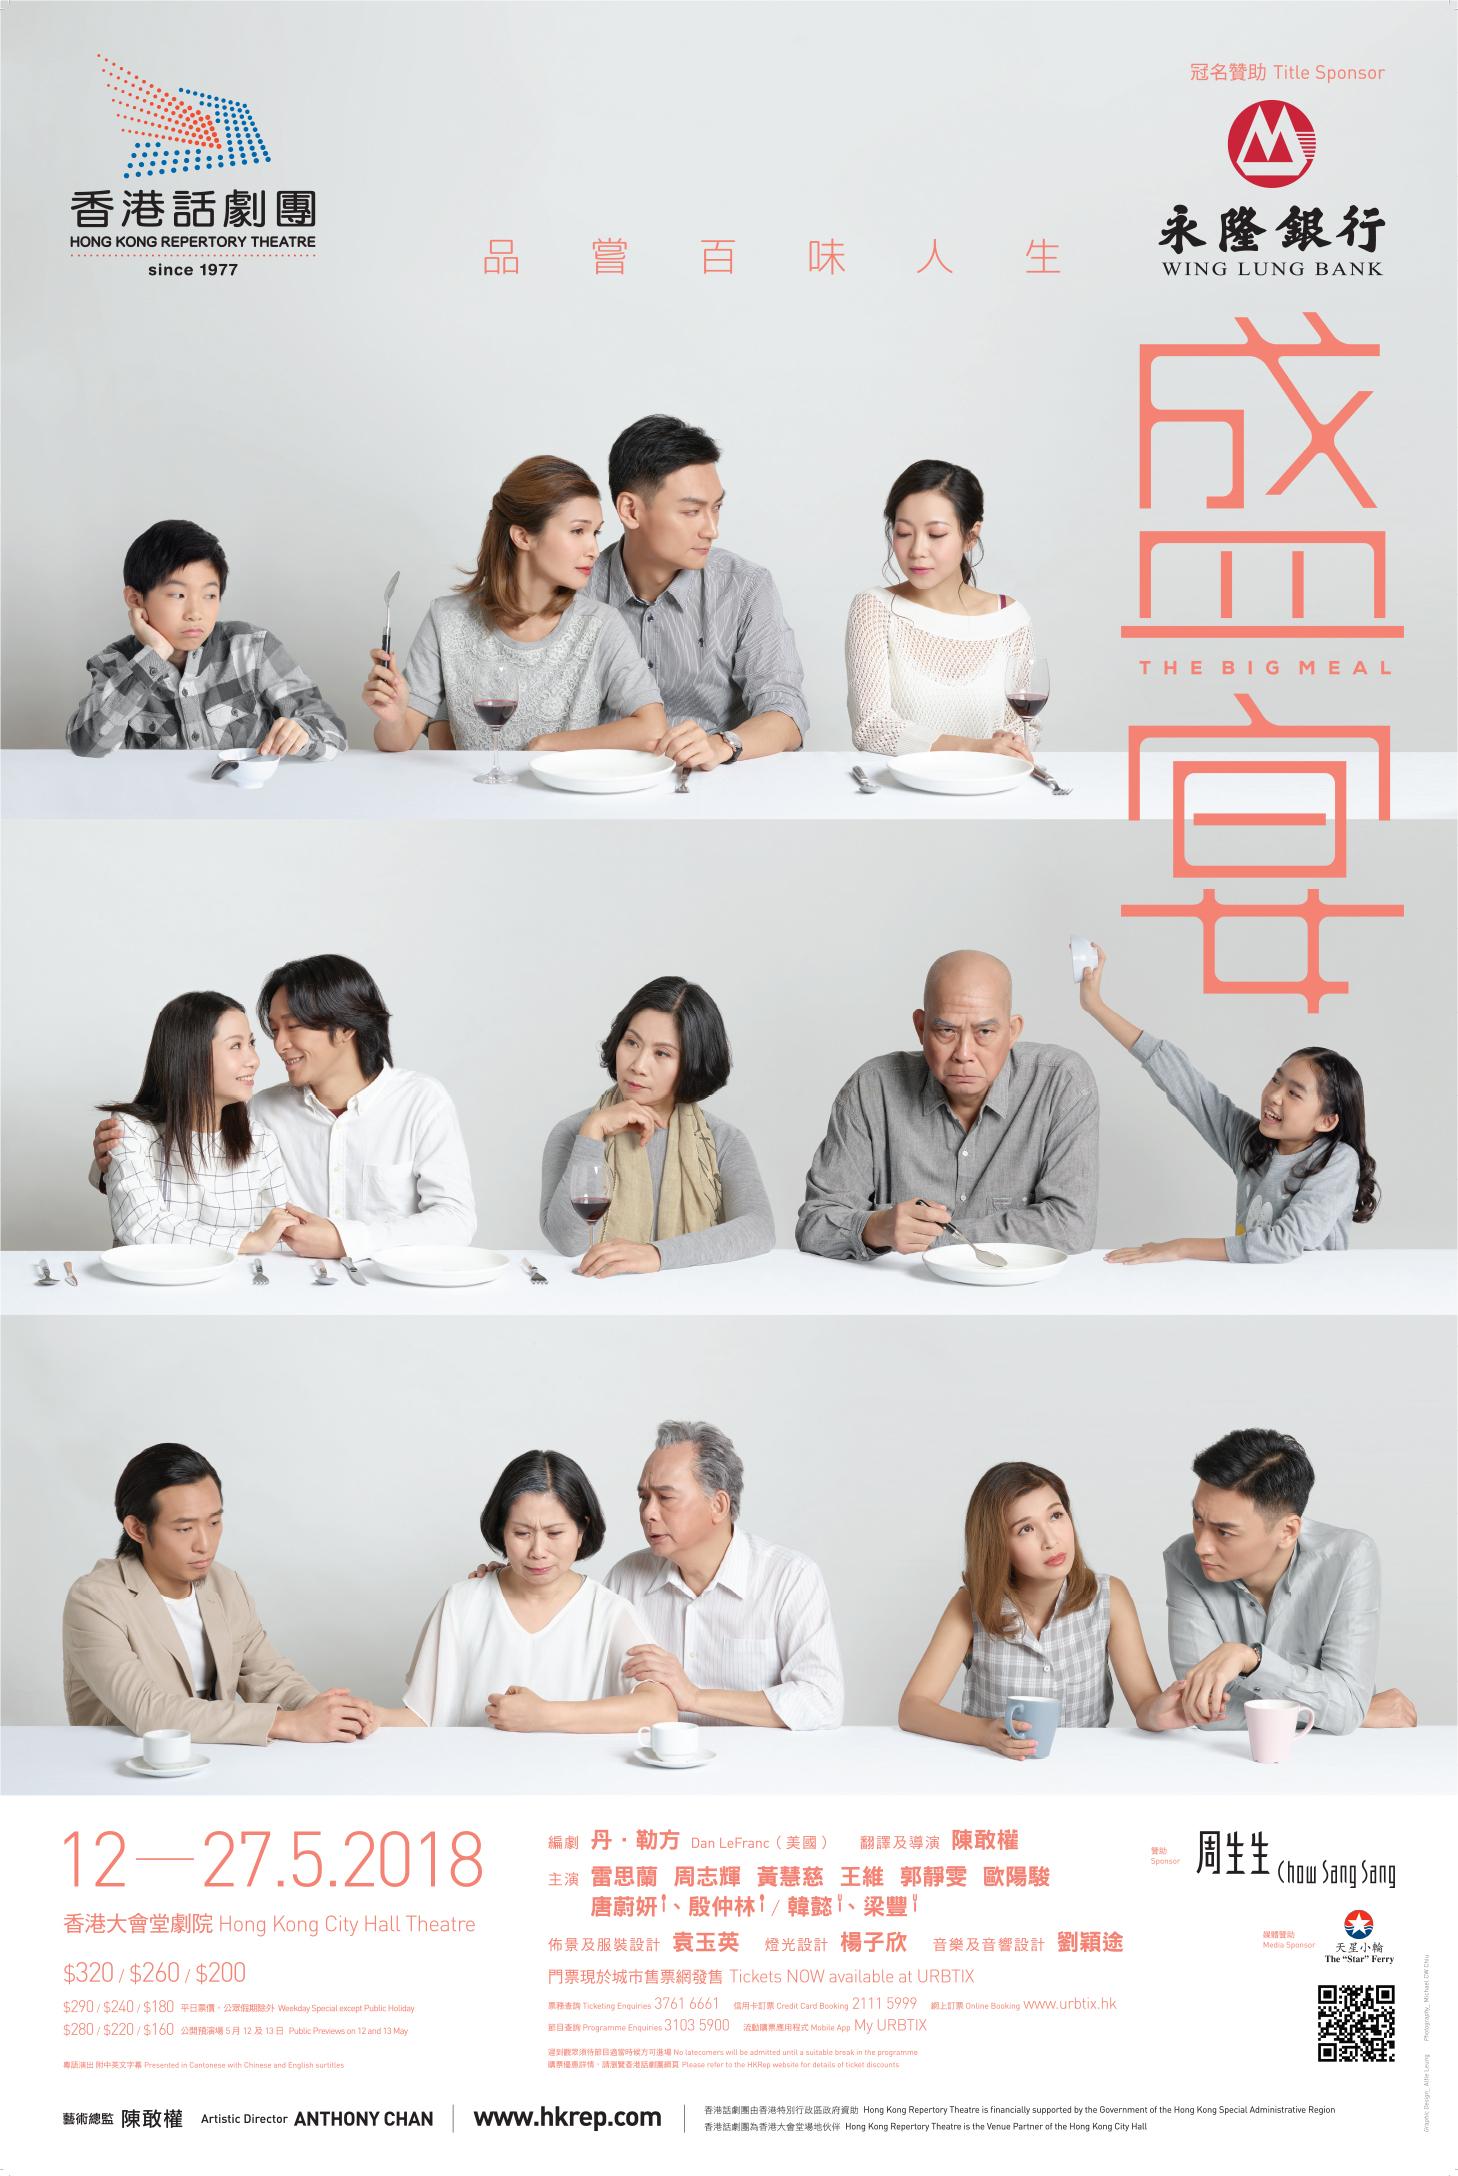 HKREP 盛宴 (Big Meal) Poster. Hong Kong. 2018